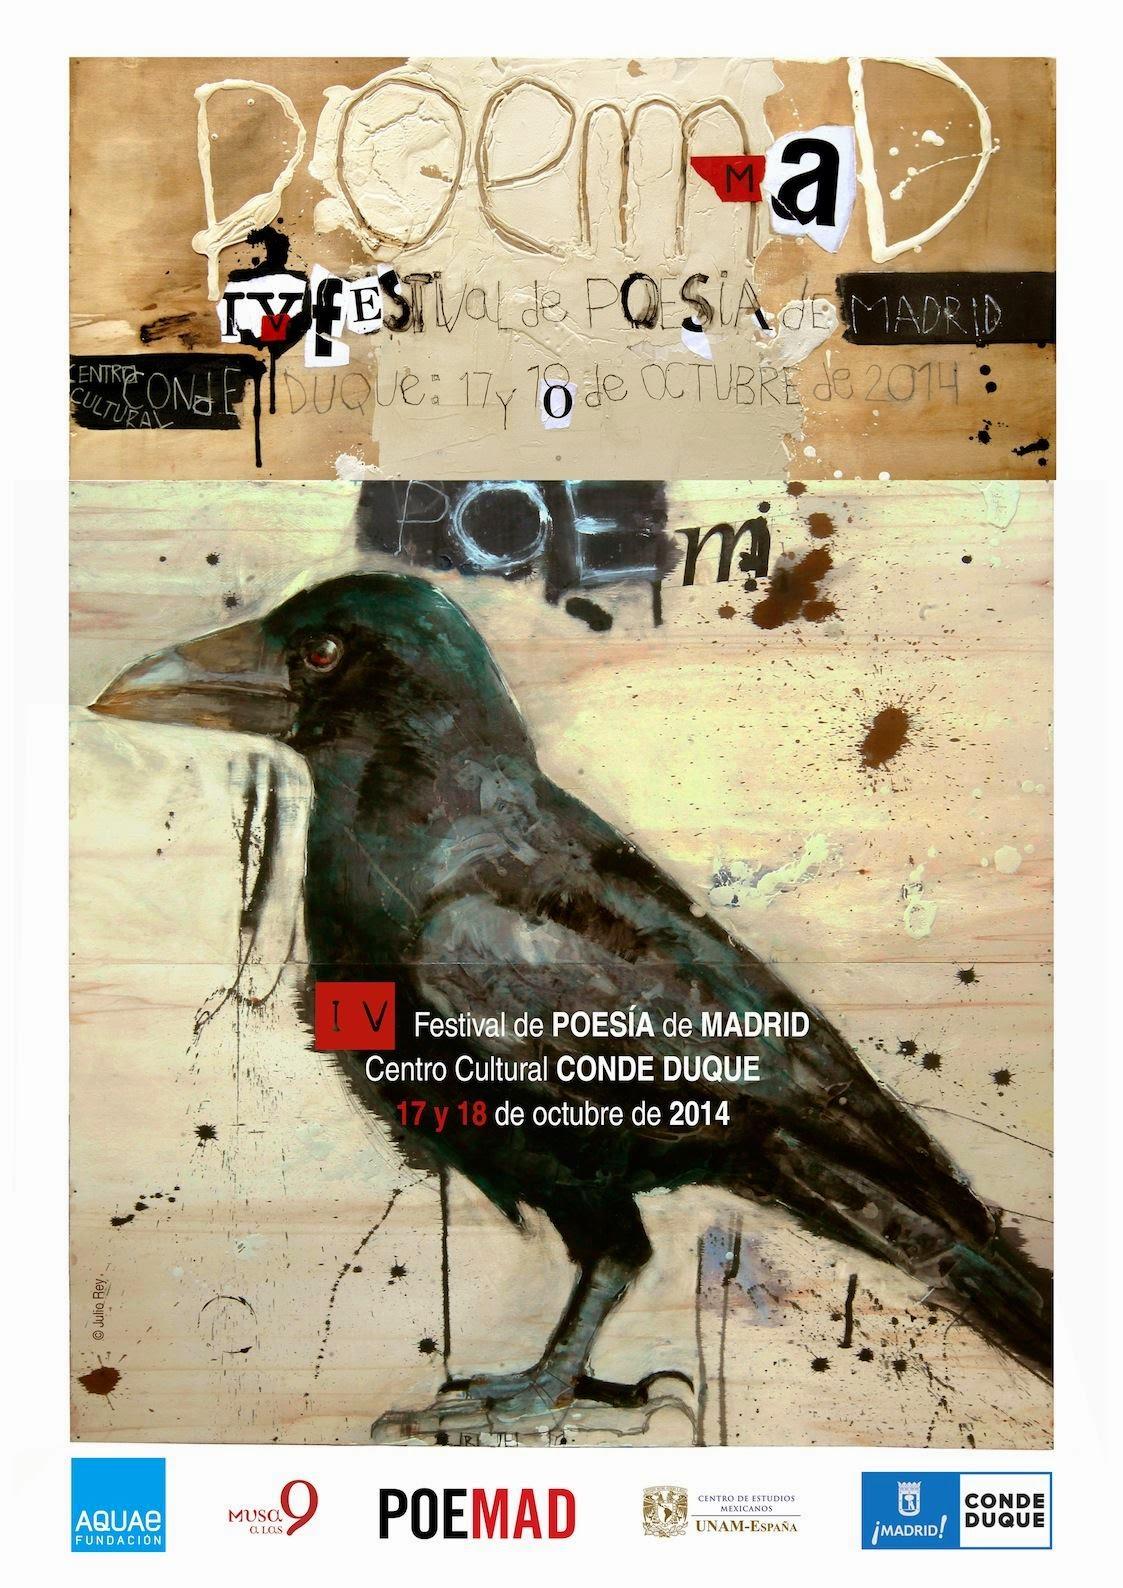 http://www.condeduquemadrid.es/evento/poemad-festival-poesia-madrid/